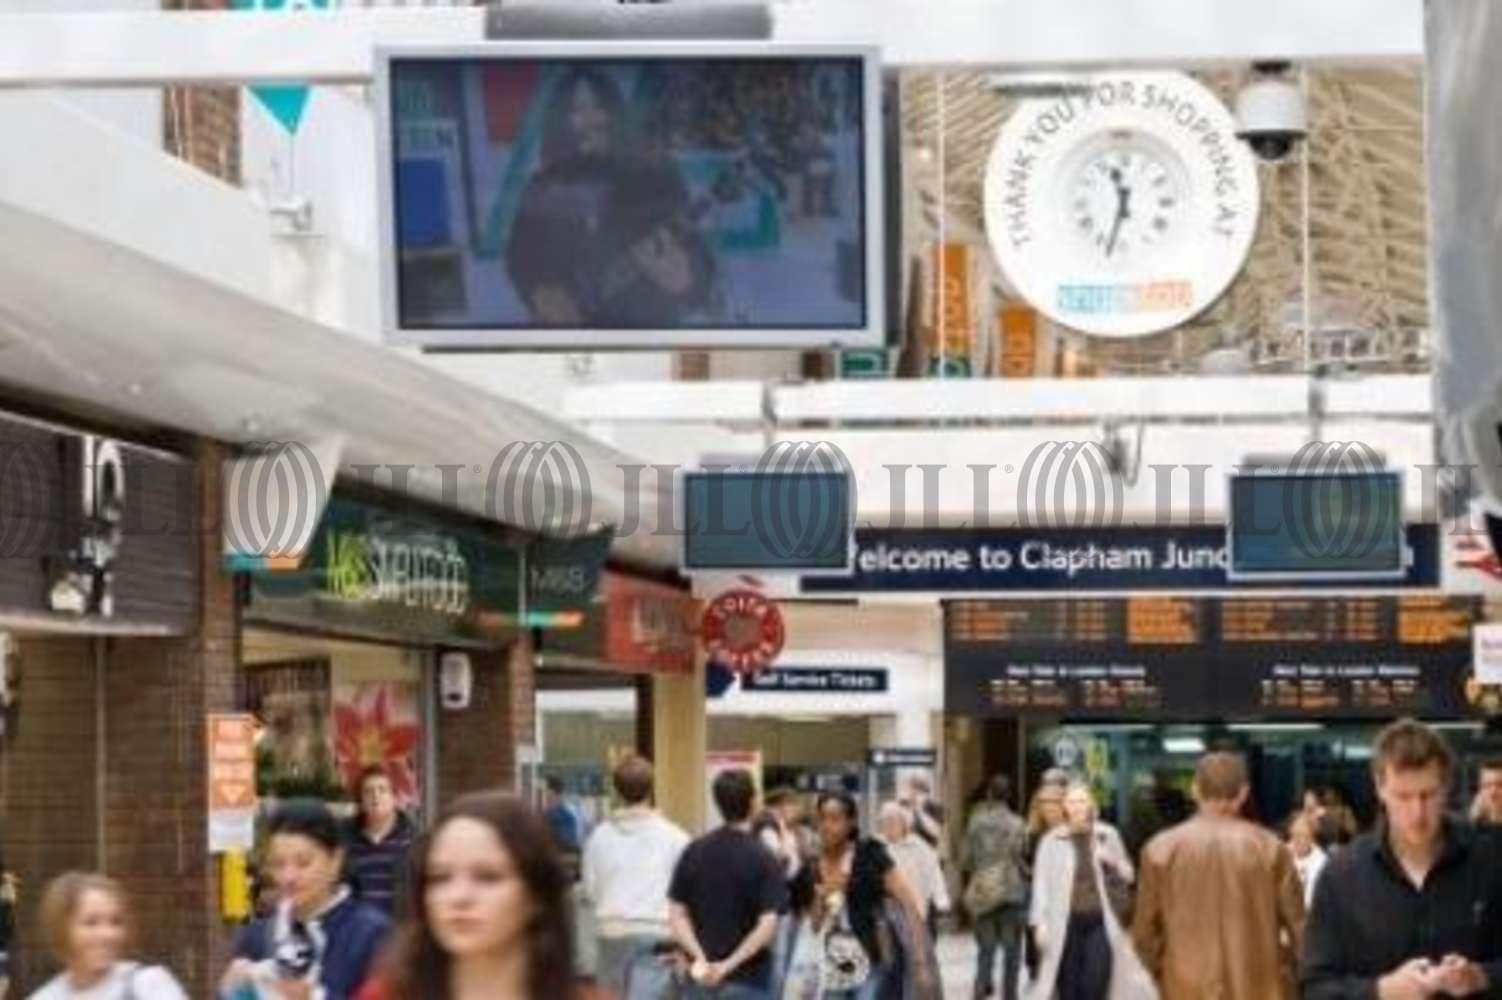 Retail shopping centre London, SW11 1RU - Shop Stop